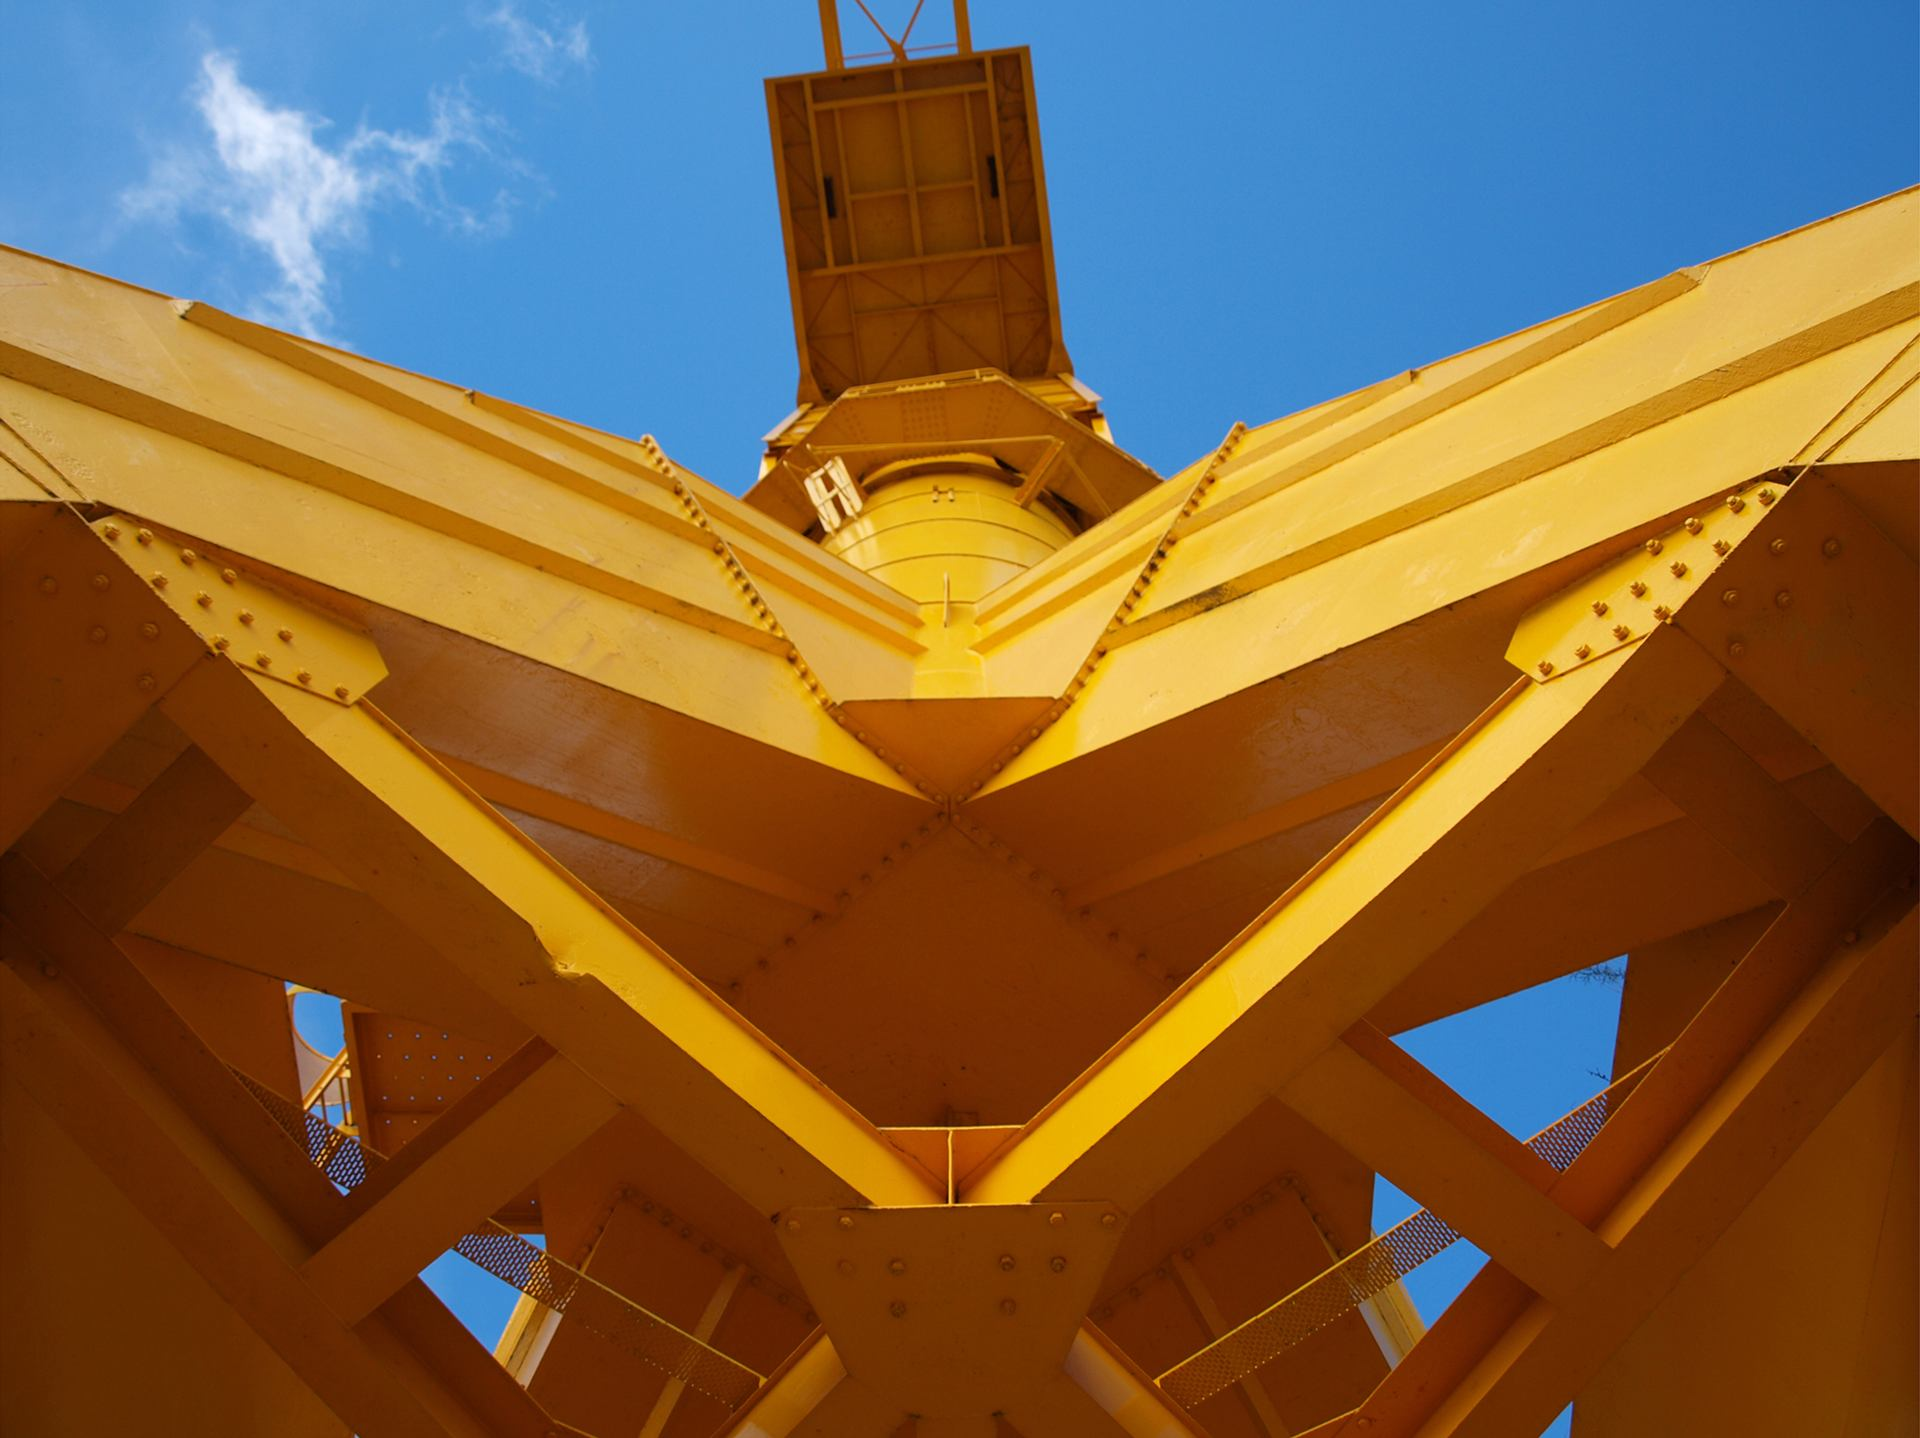 Grue Titan jaune de Nantes